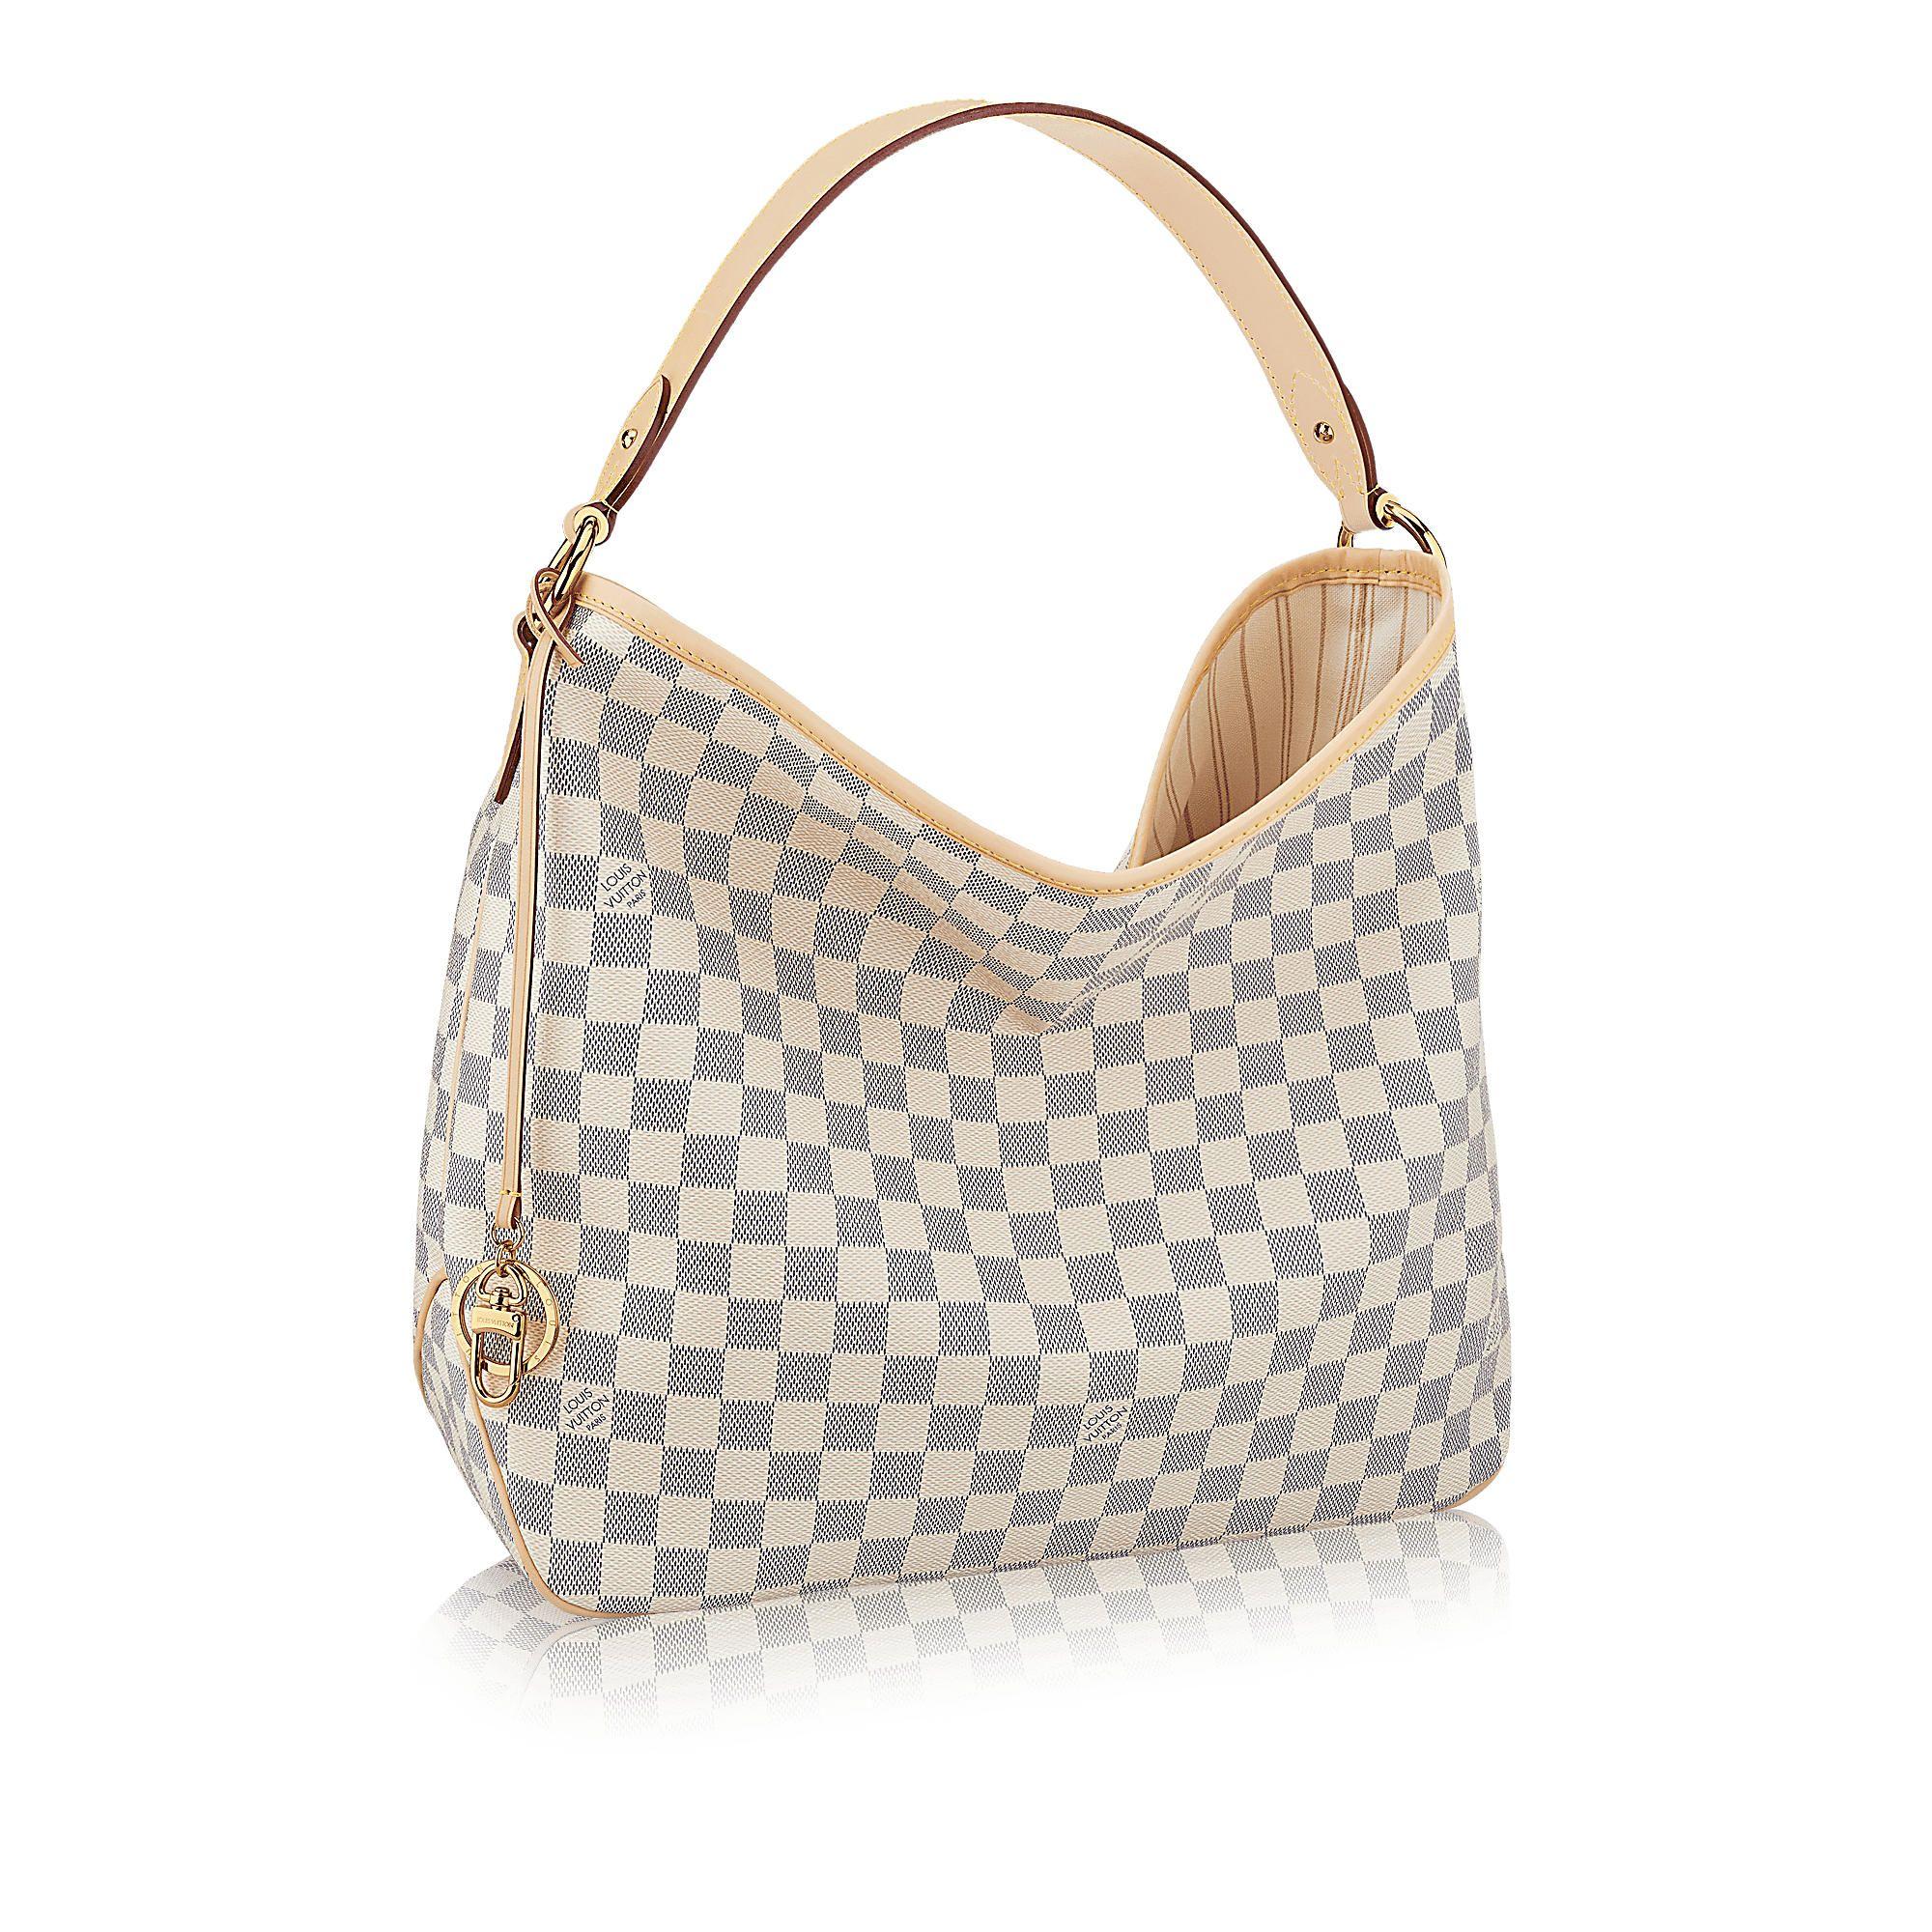 1387bdb3bf11 Louis Vuitton Damier Canvas Delightful MM Handbag Article Made in France